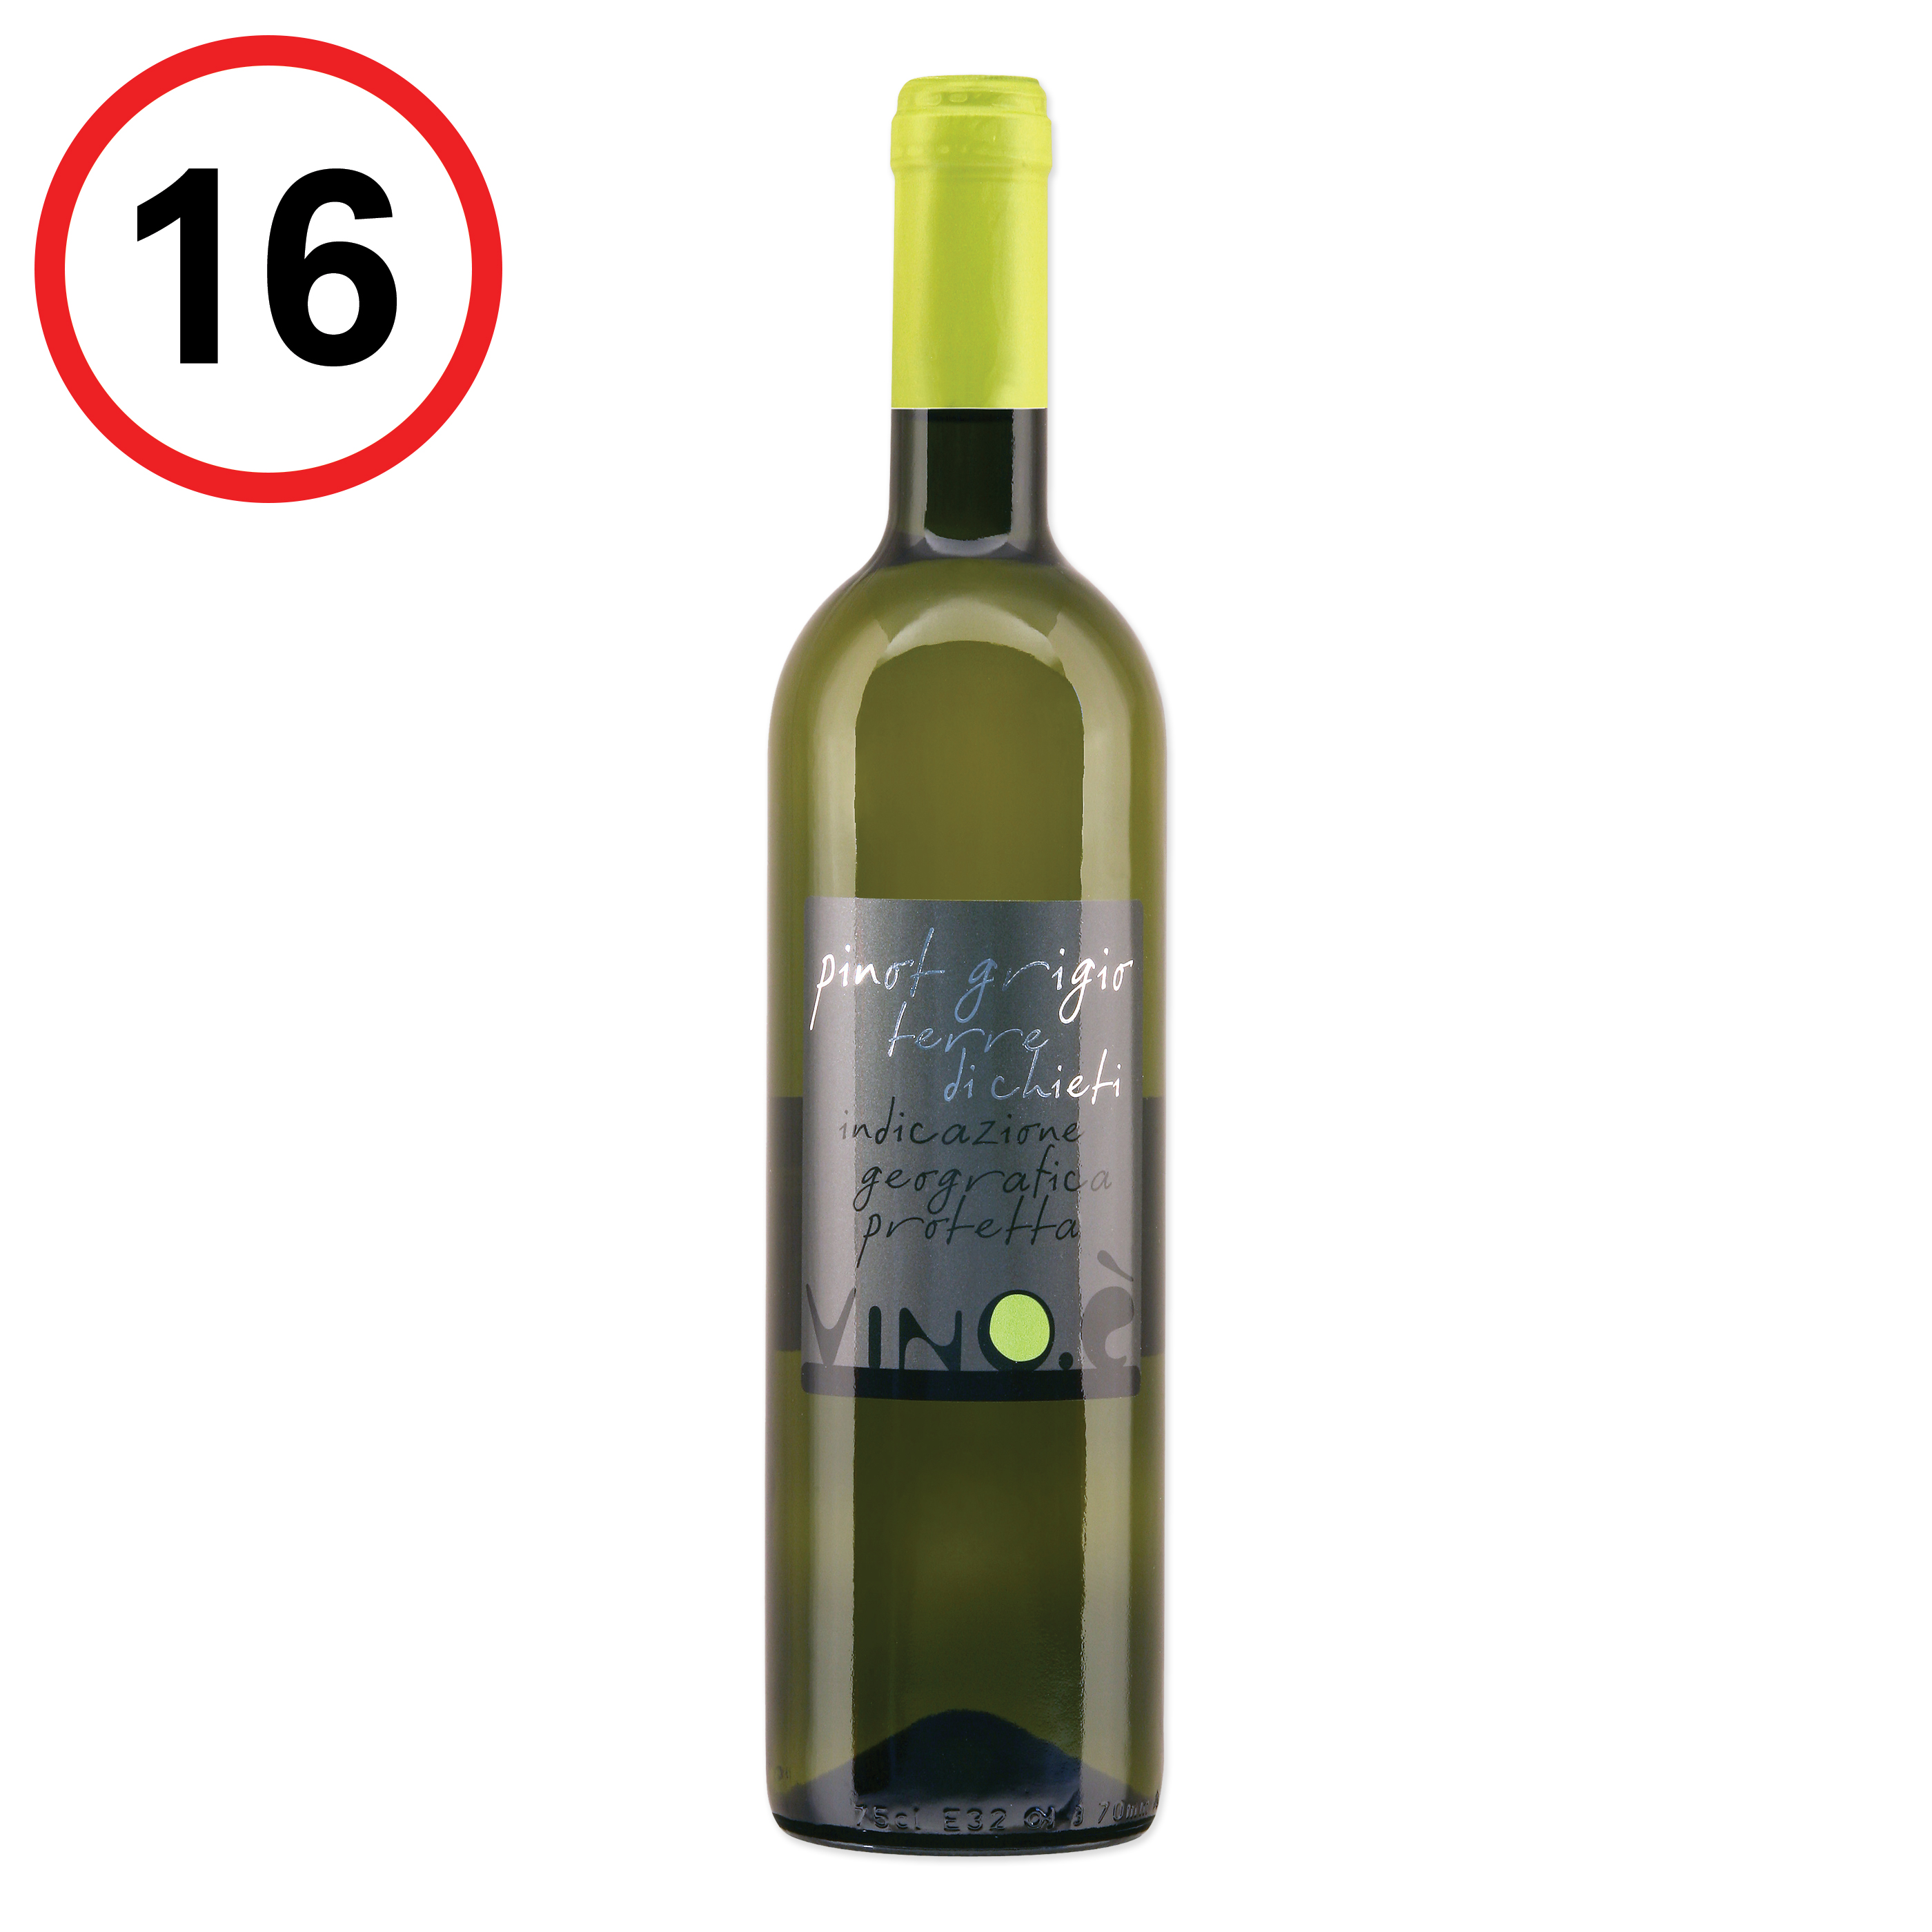 Pinot Grigio terre di chieti IGP, Weisswein